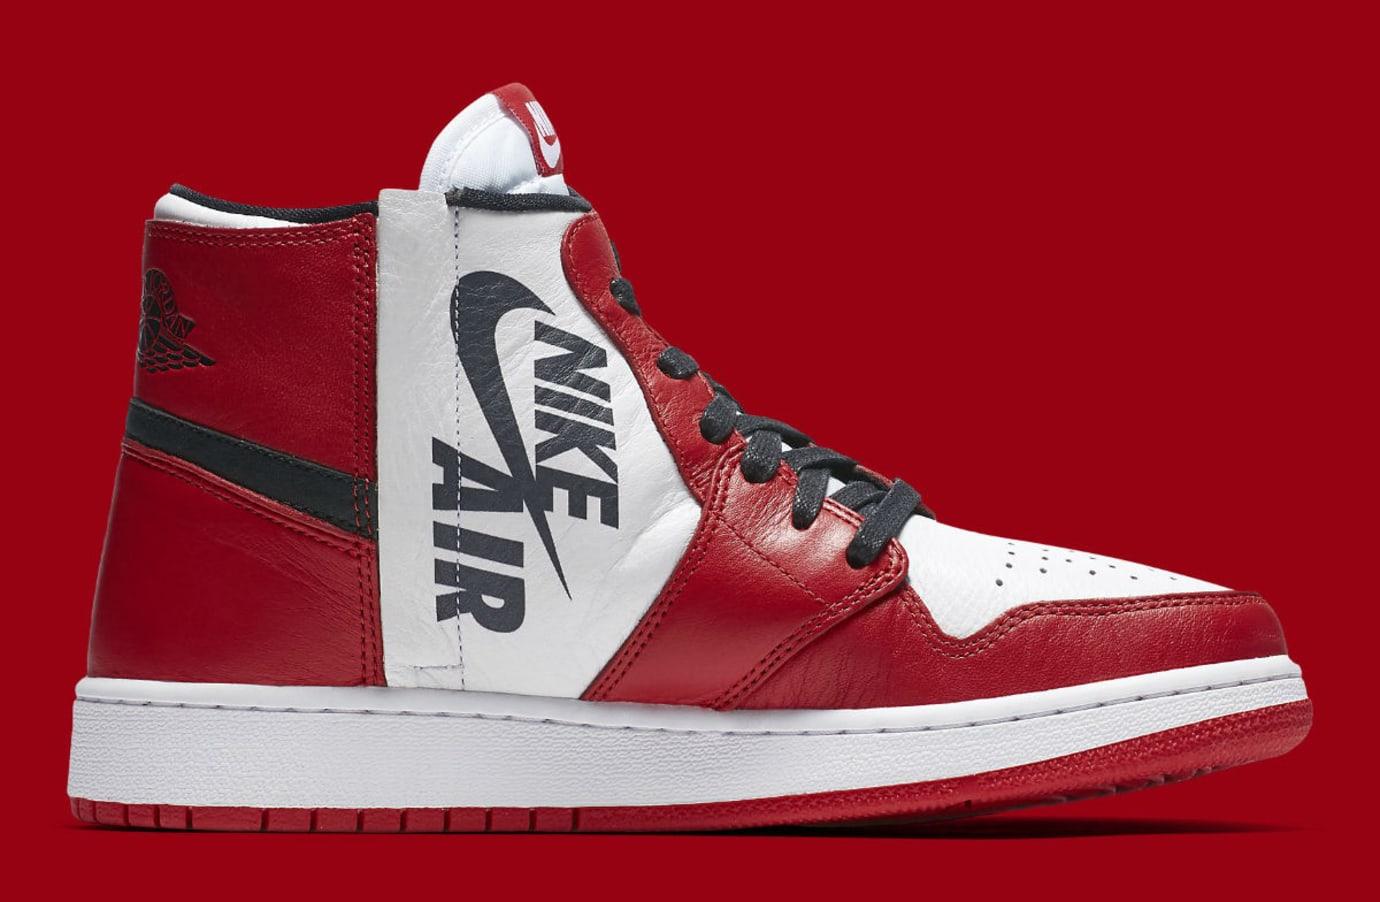 Air Jordan 1 I Rebel XX Chicago Release Date AT4151-100 Medial